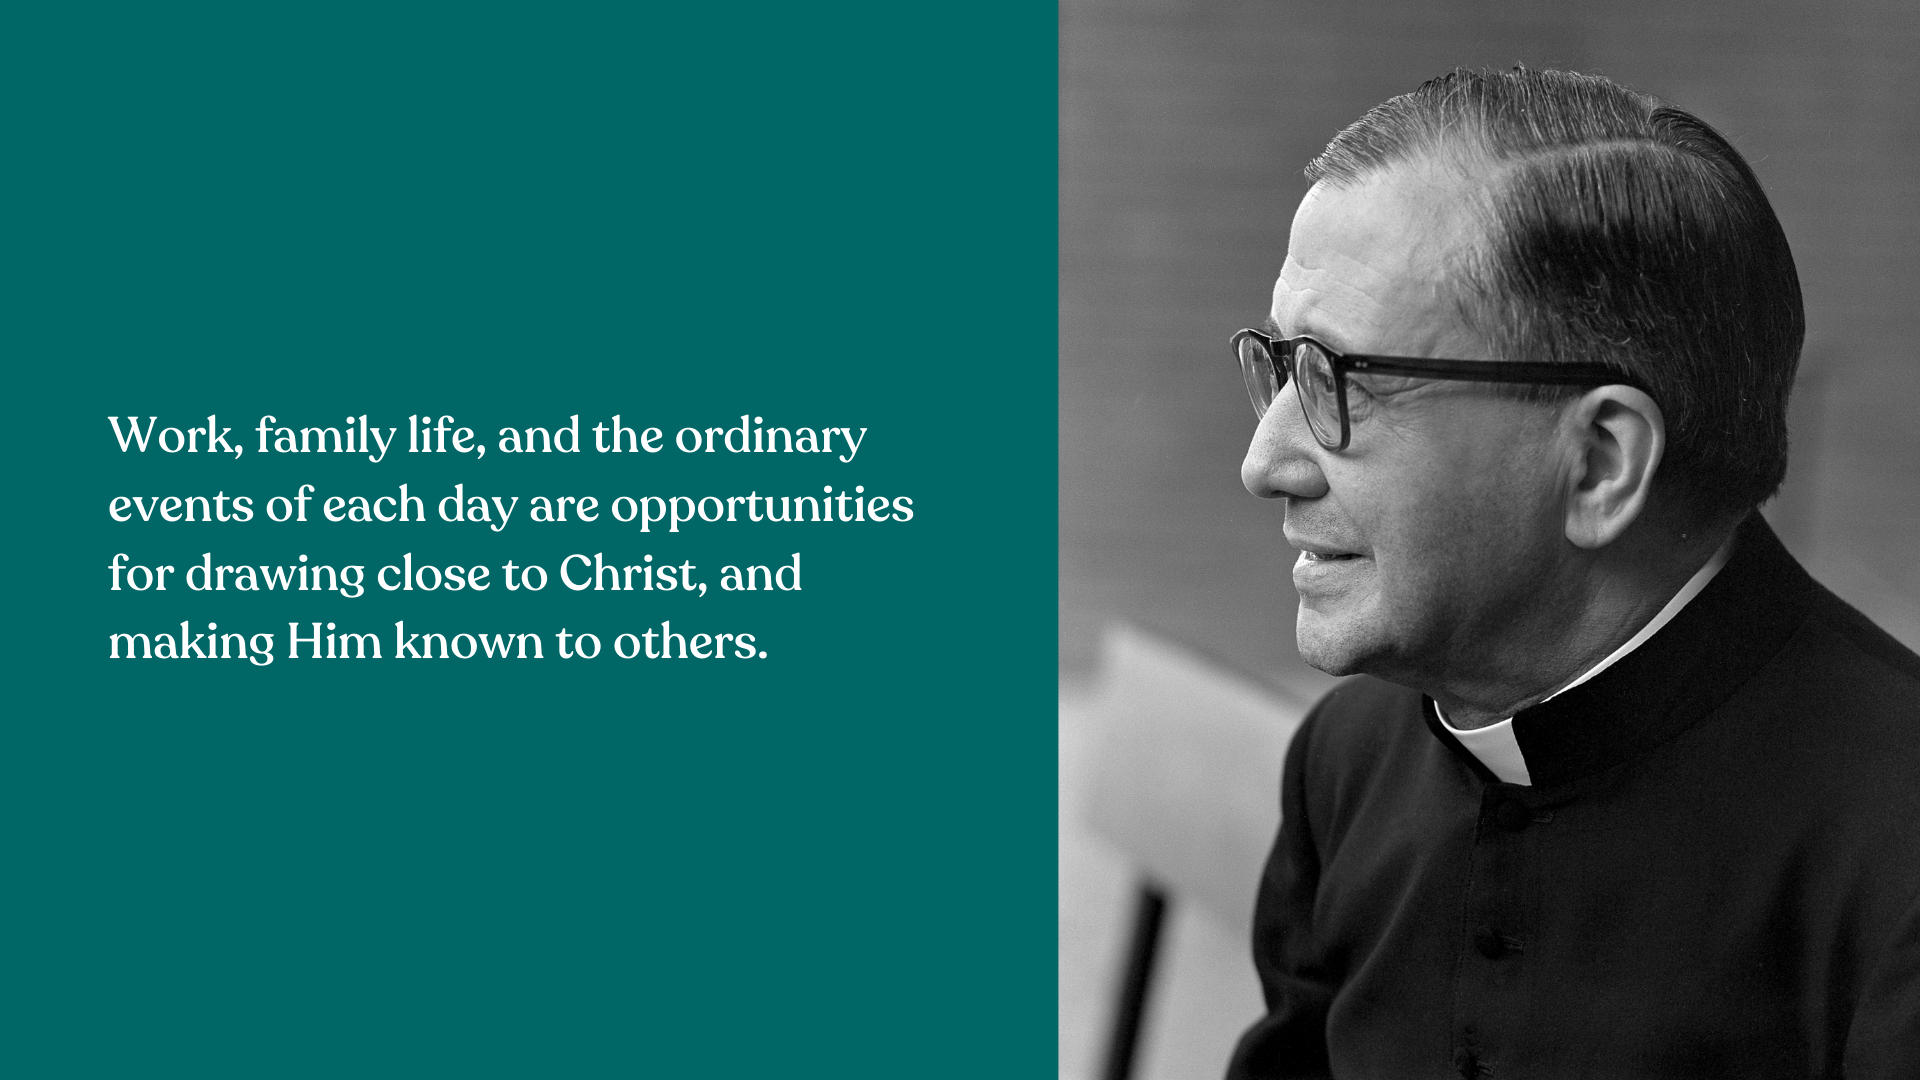 About Opus Dei